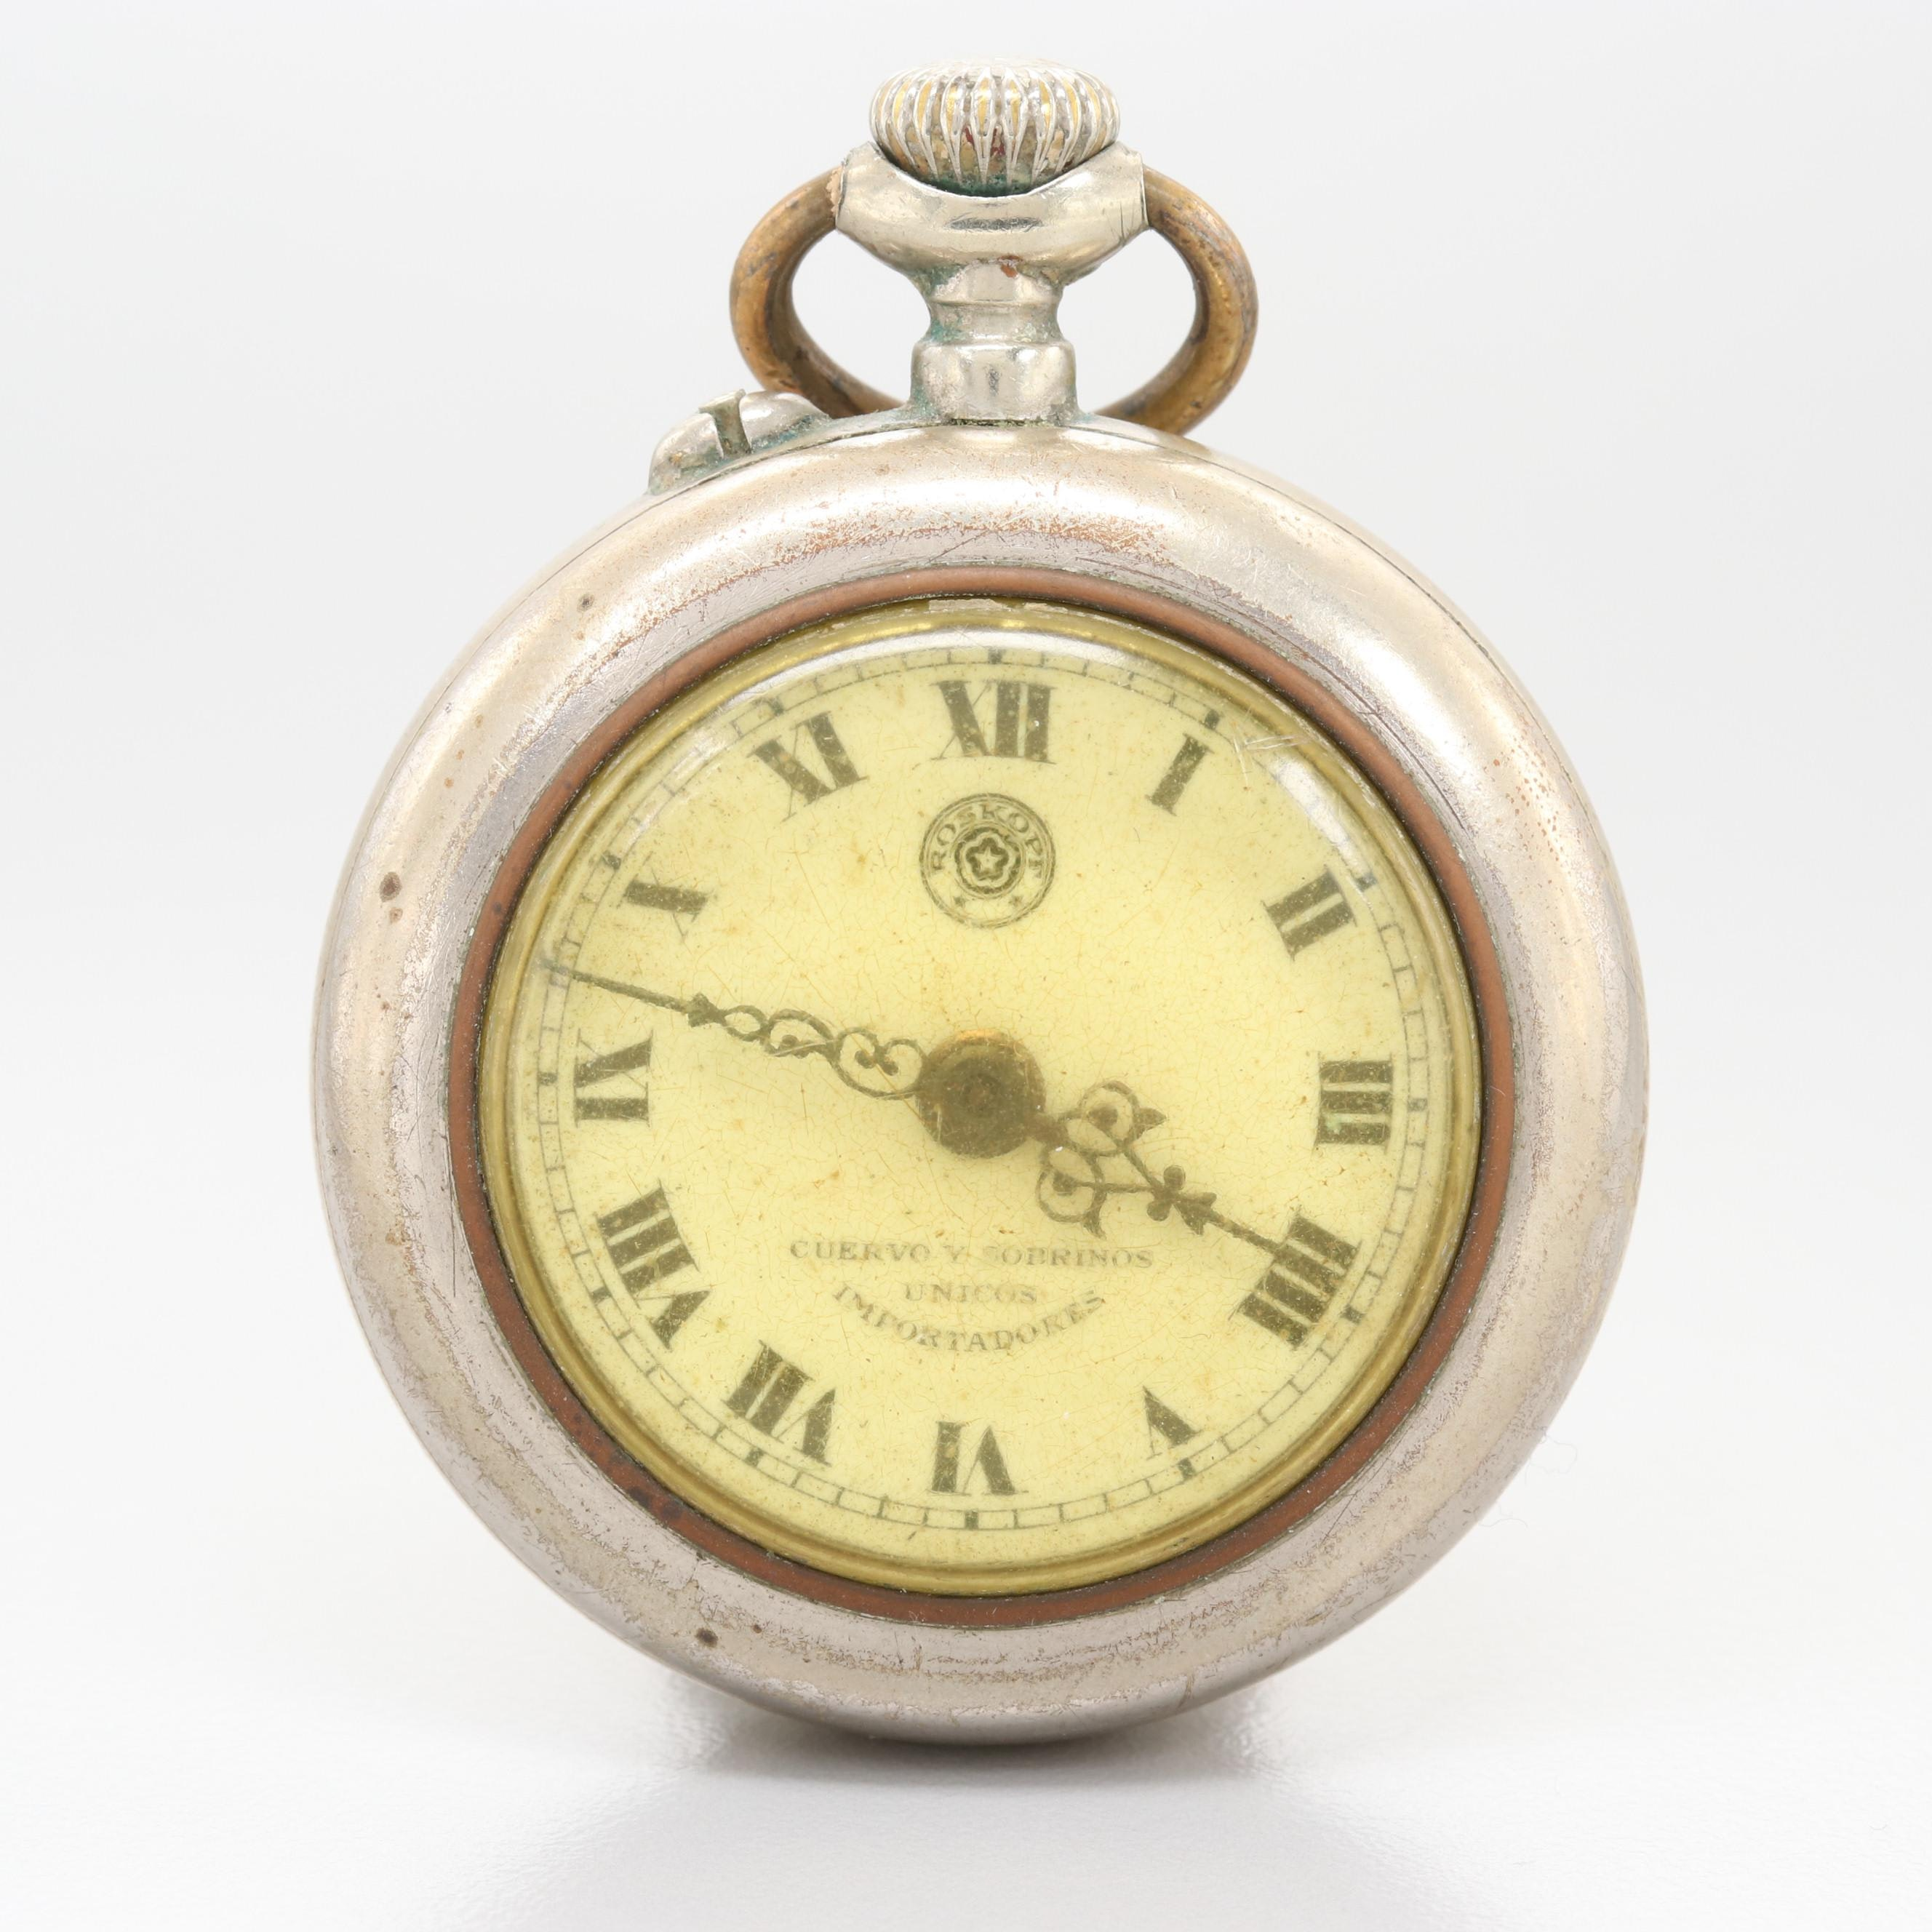 Roskopf by Cuervo y Sobrinos Habana Nickel Pocket Watch